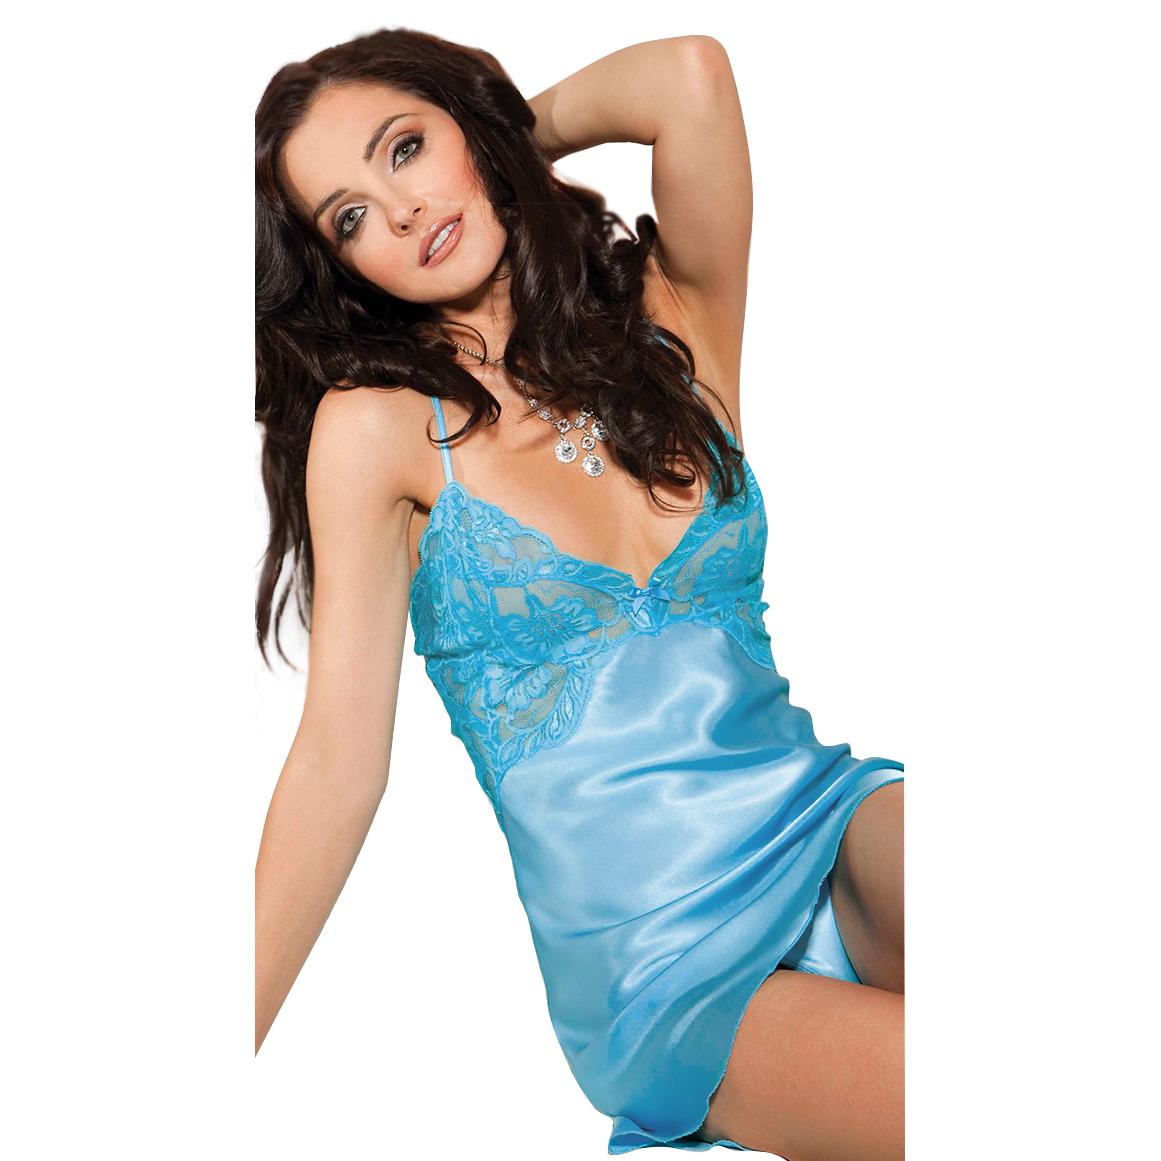 Hot Sexy Asian Woman Dressing 14